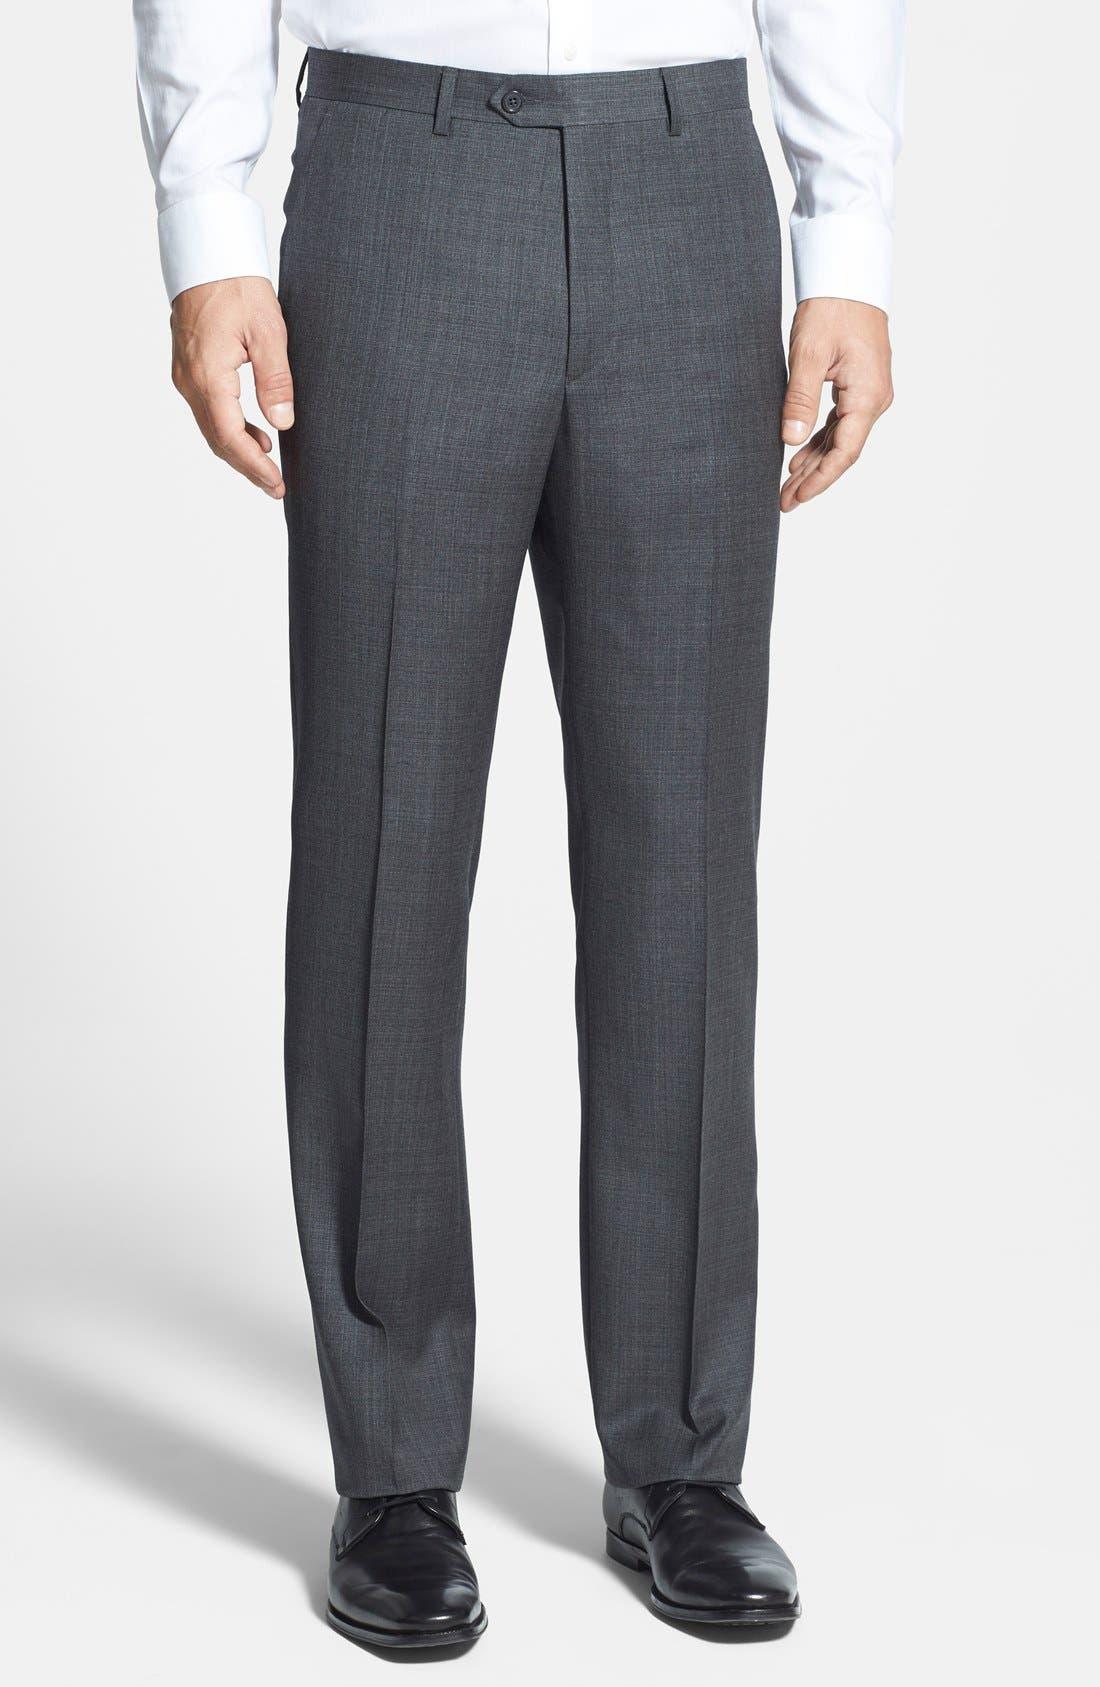 Main Image - Santorelli Flat Front Wool Trousers